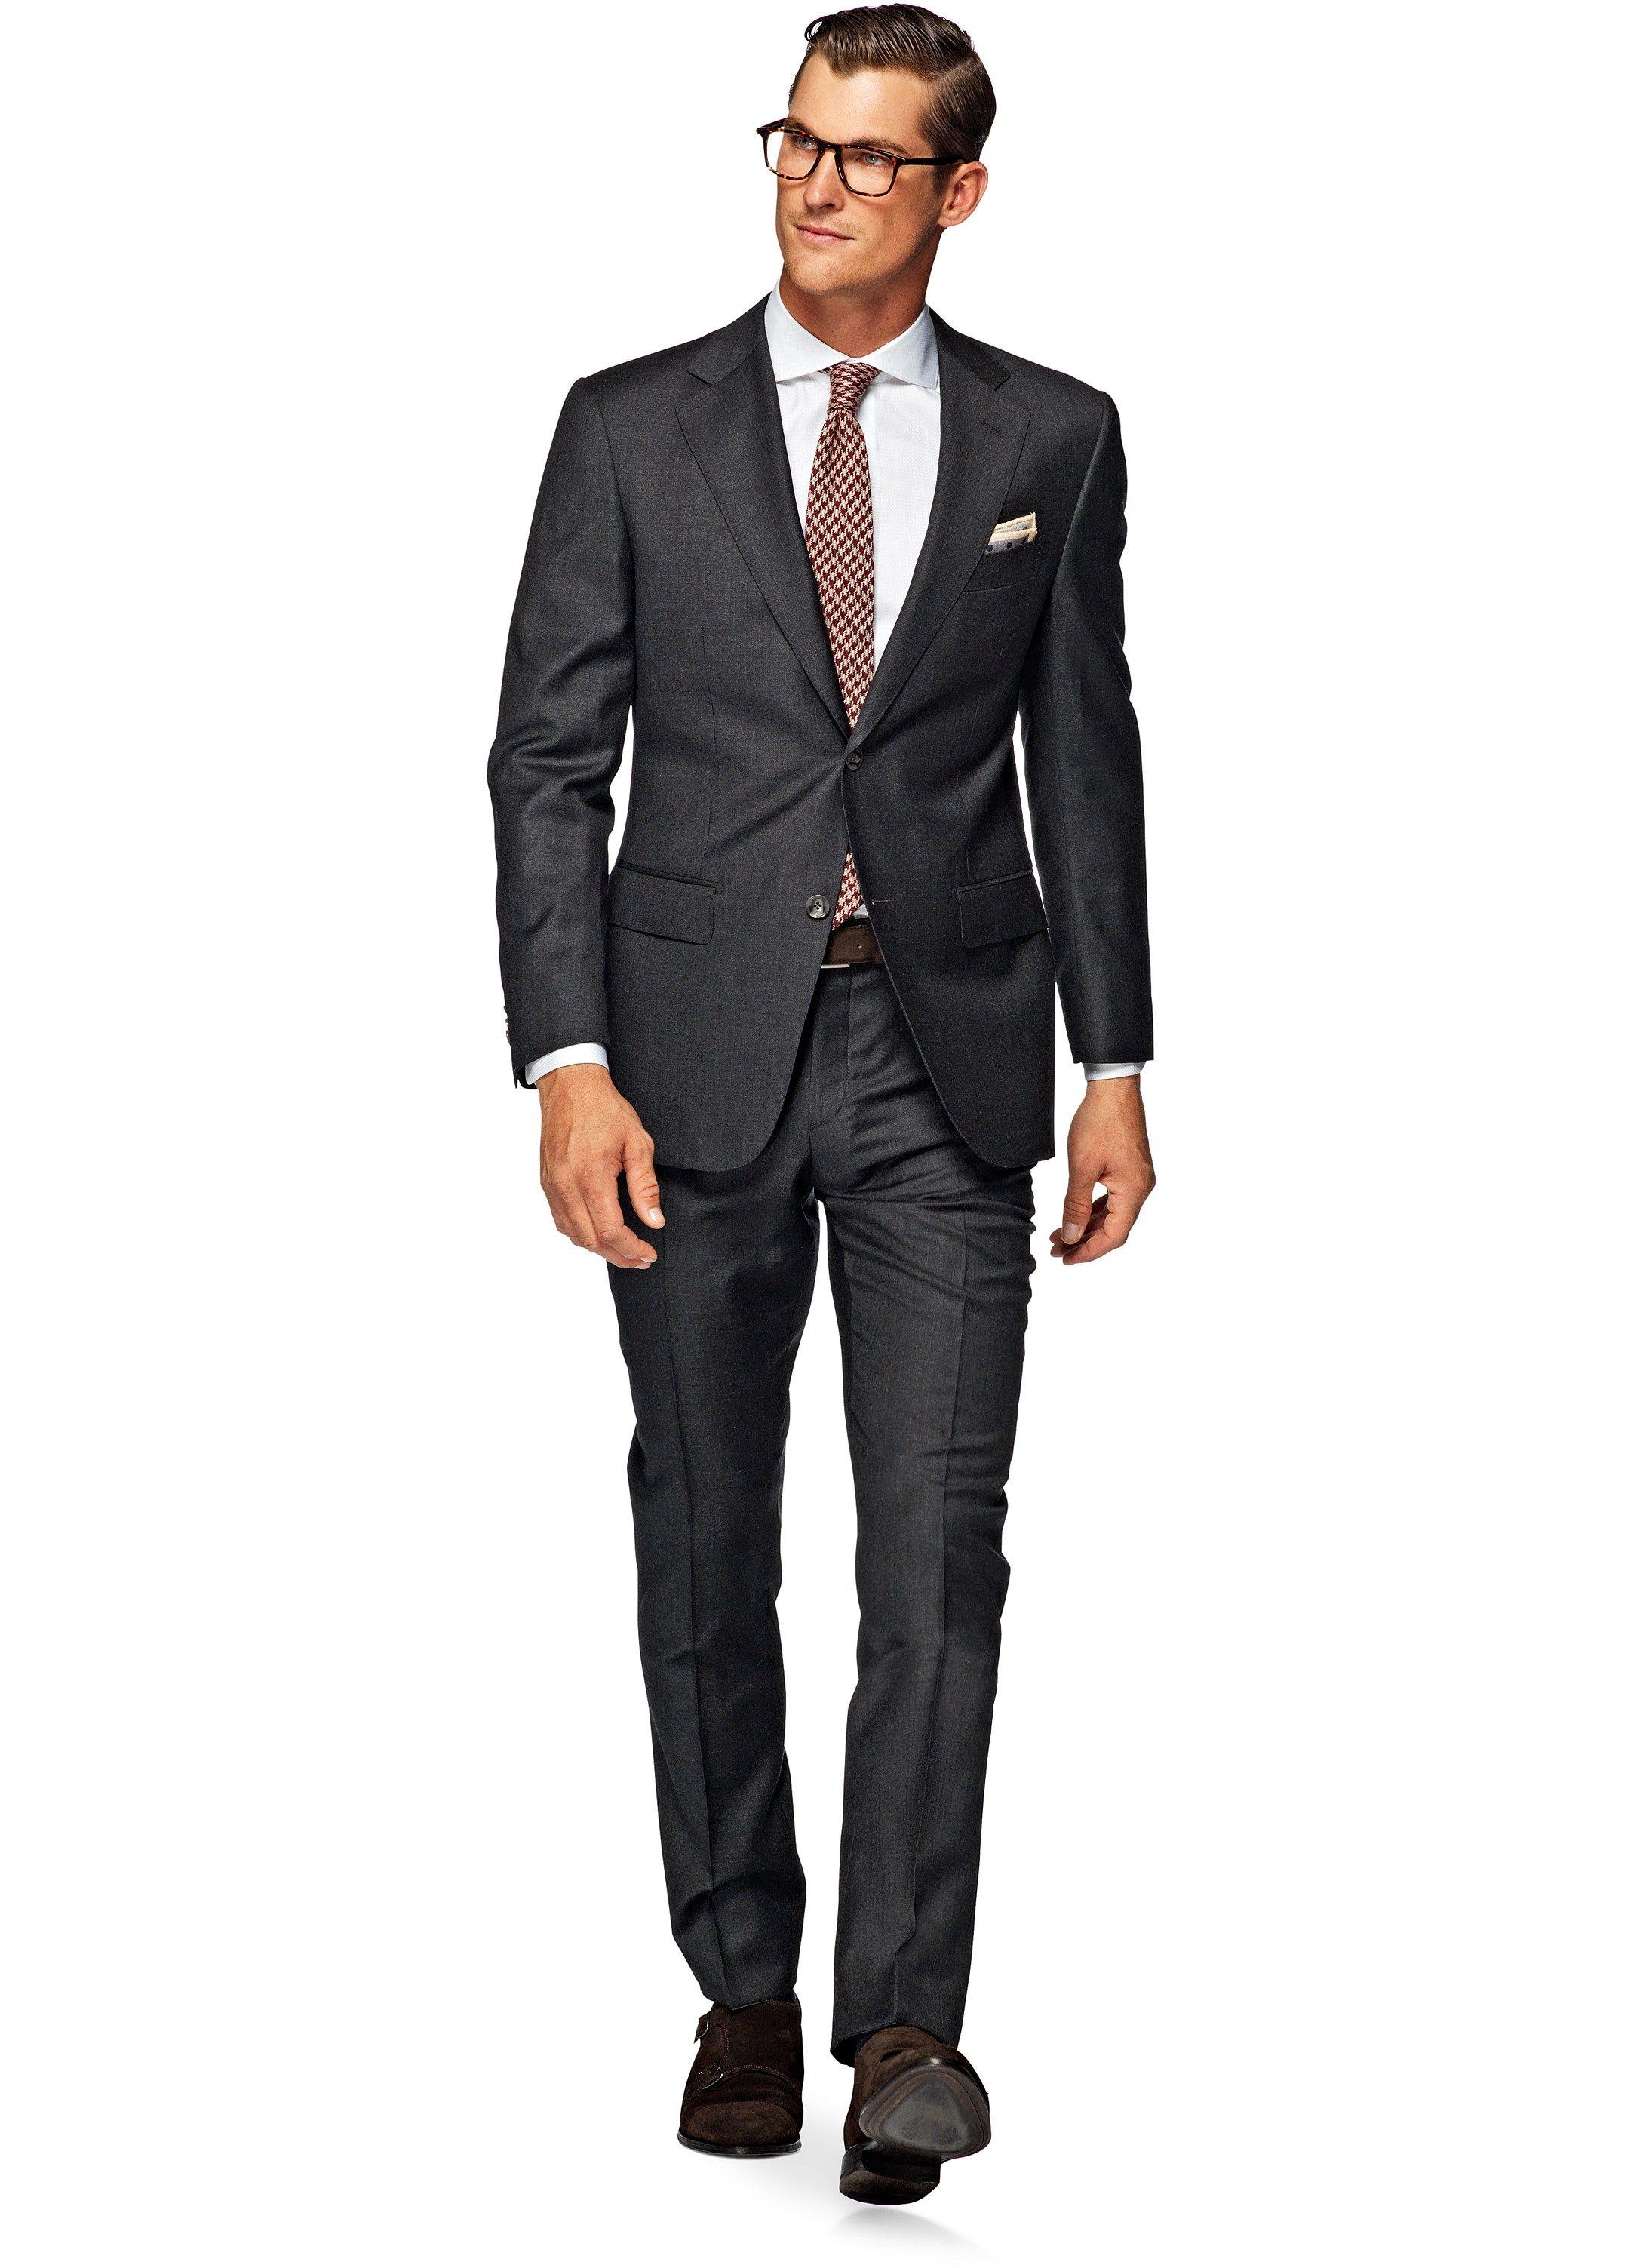 0953ffe191e810 Suit Dark Grey Plain Napoli P3755i – Suitsupply